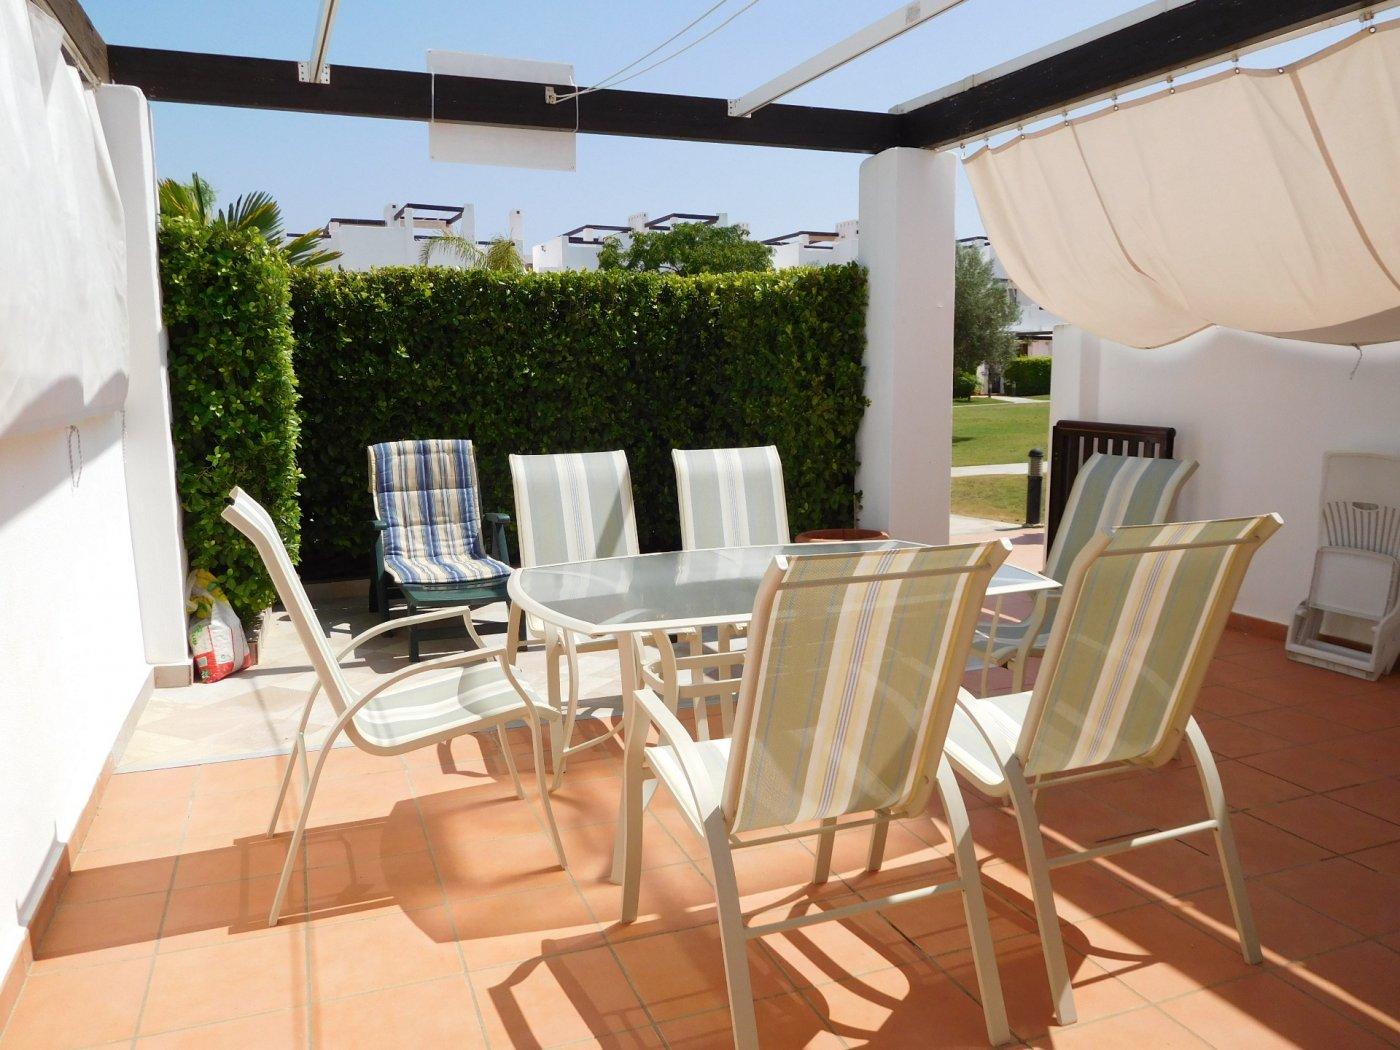 Photo for Se Vende Apartamento en Condado De Alhama, Alhama De Murcia Con Piscina